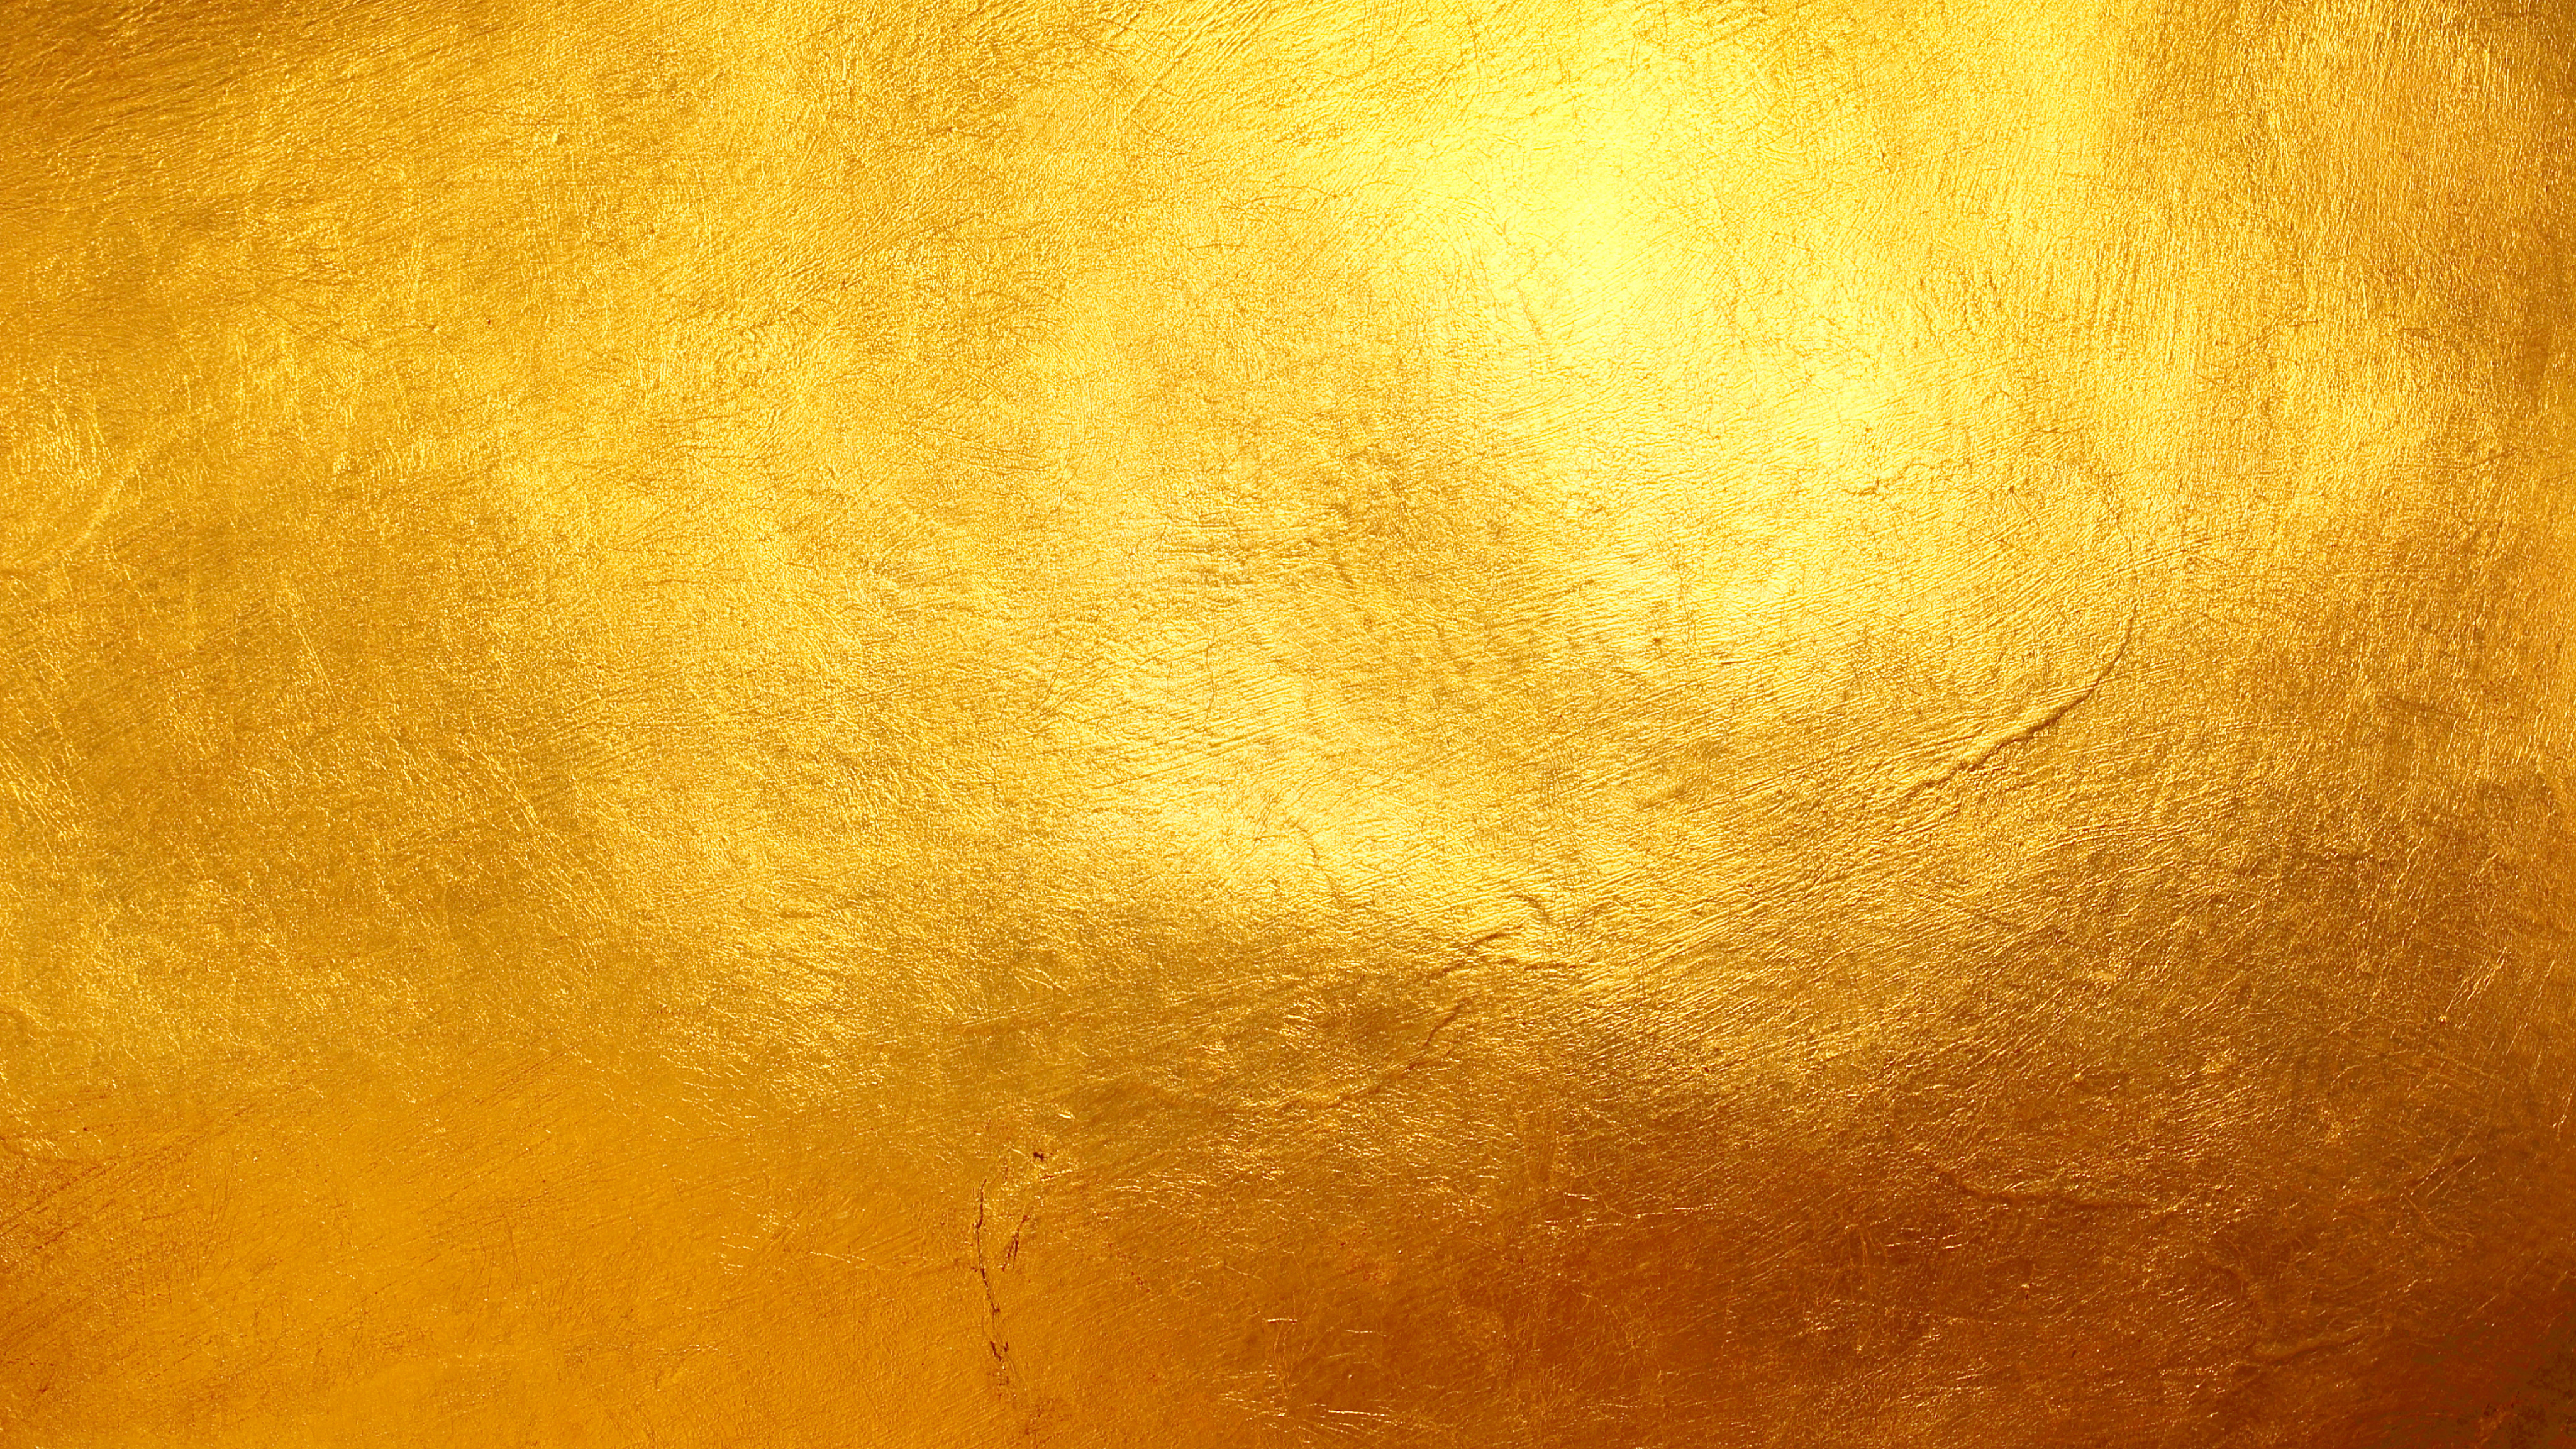 Золотистый фон своими руками